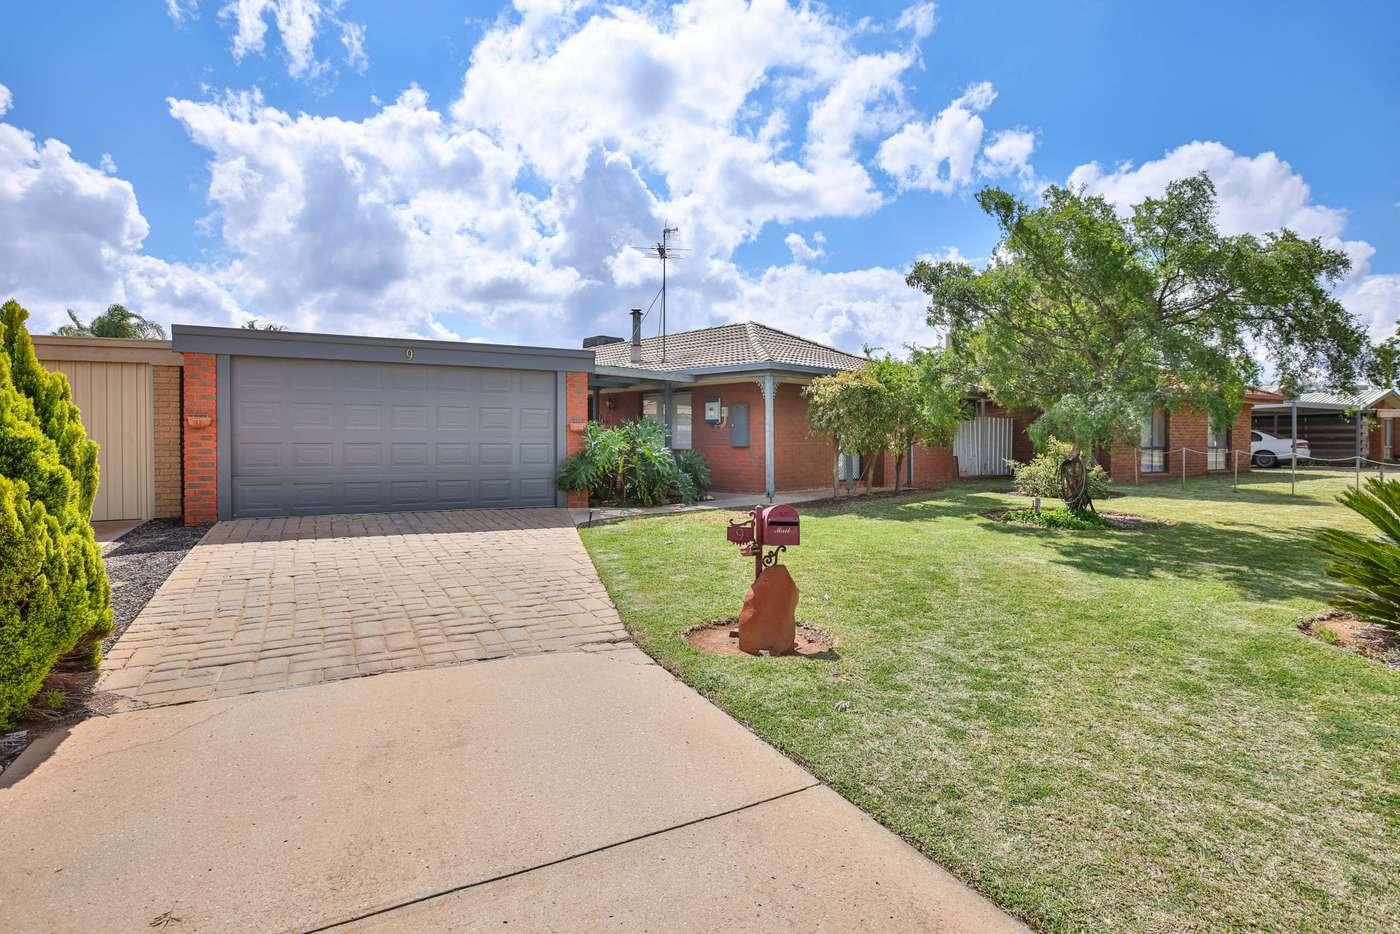 Main view of Homely house listing, 9 Etherington Drive, Mildura VIC 3500